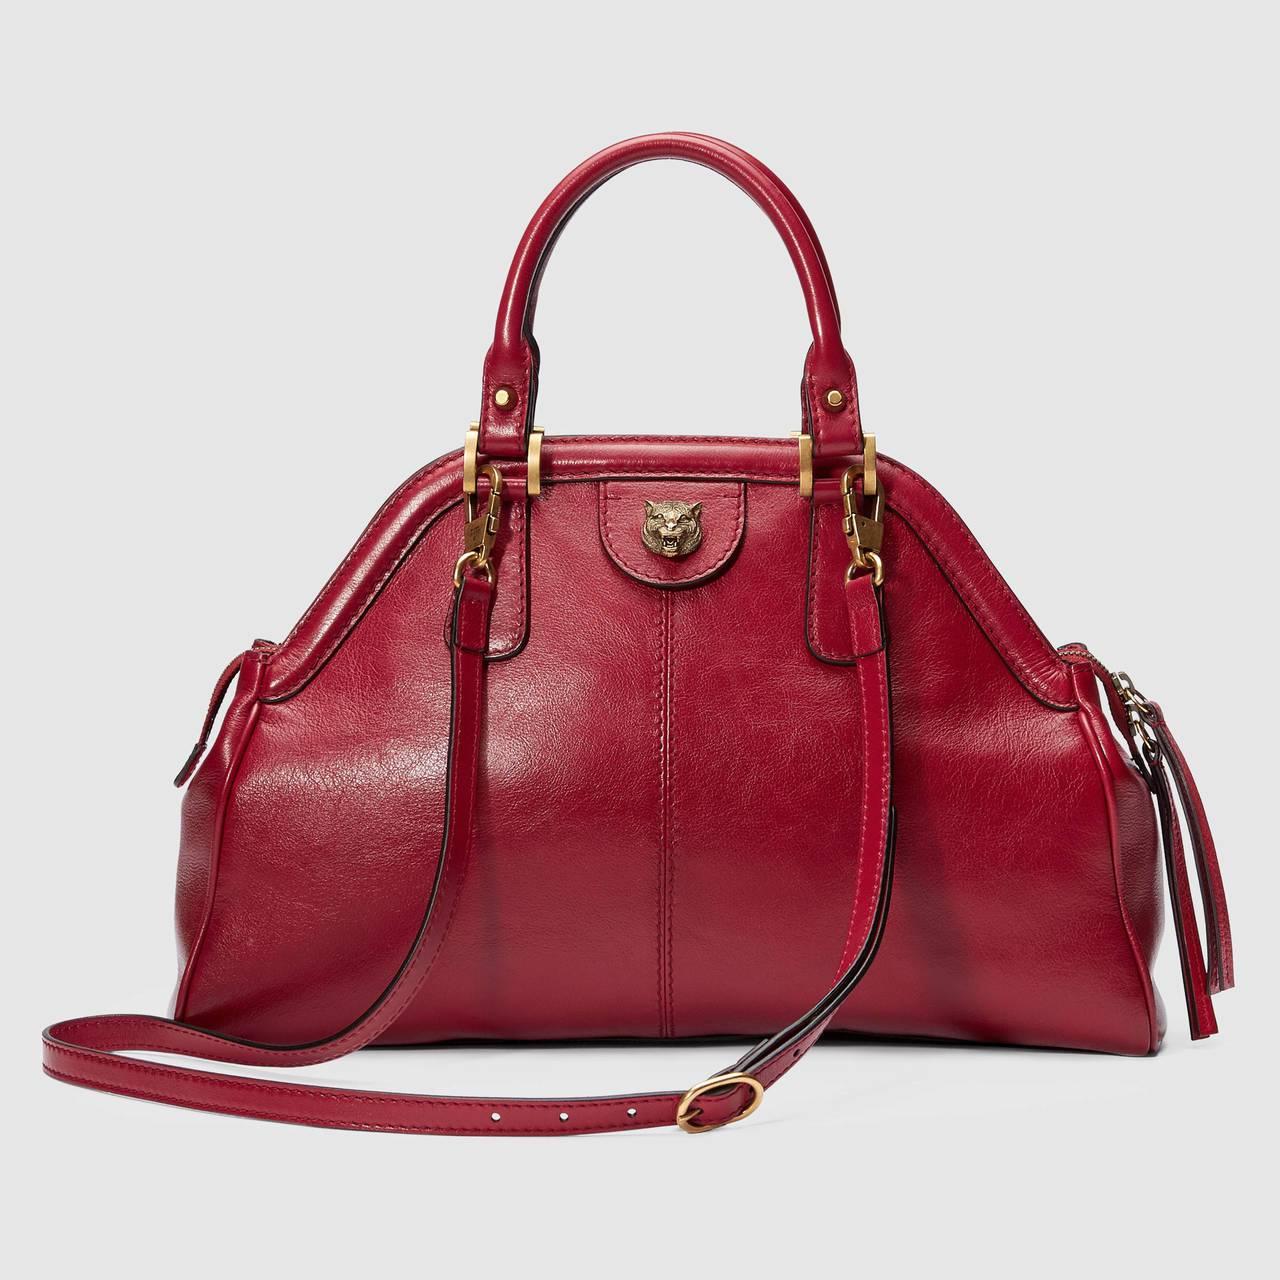 RE(BELLE) 復古刷色手提肩背包,93,600元。圖/Gucci提供